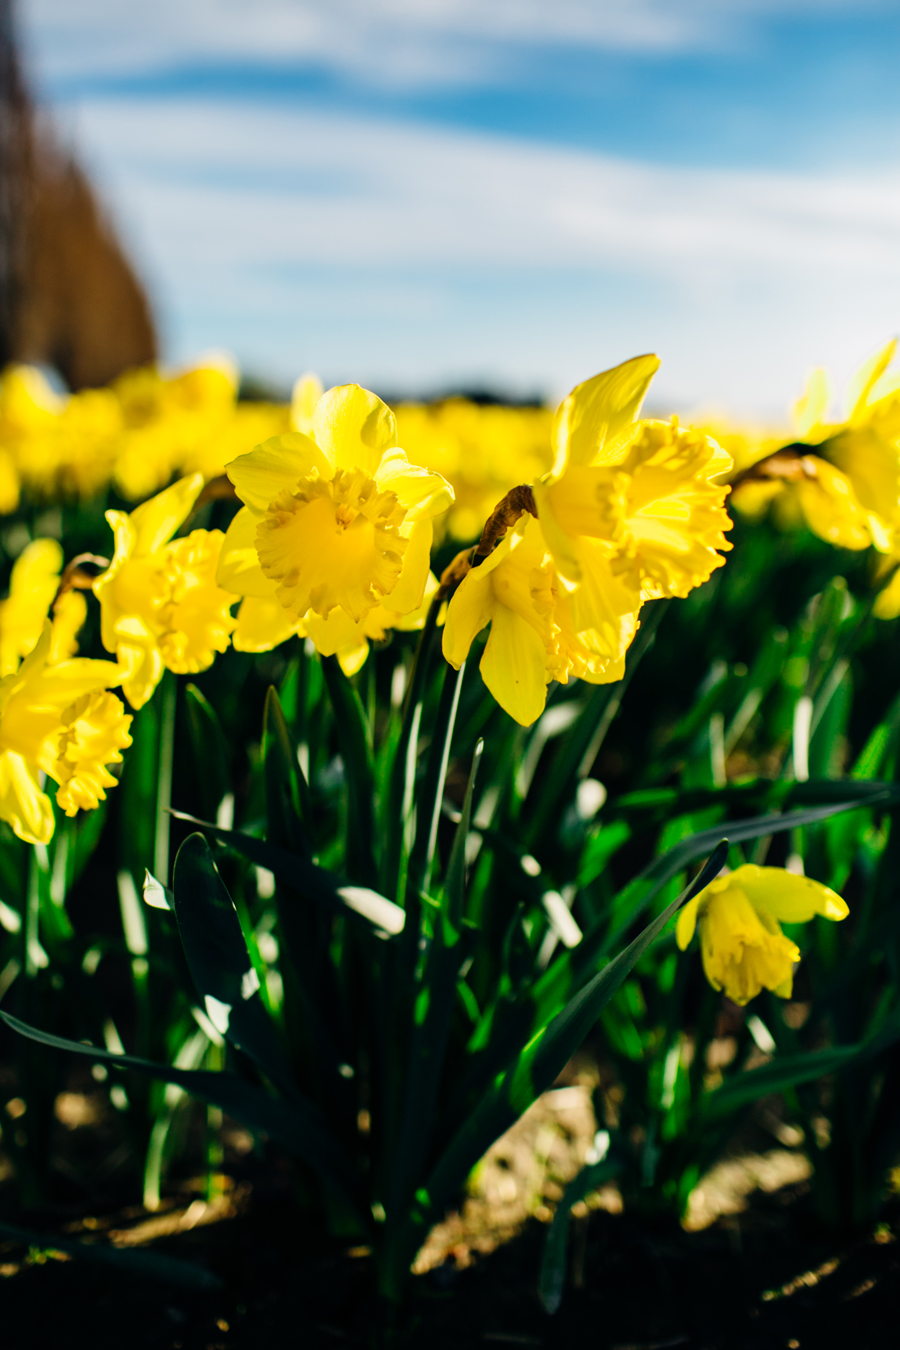 004-skagit-vallery-mount-vernon-washington-daffodils-tulip-festival-katheryn-moran-photography.jpg